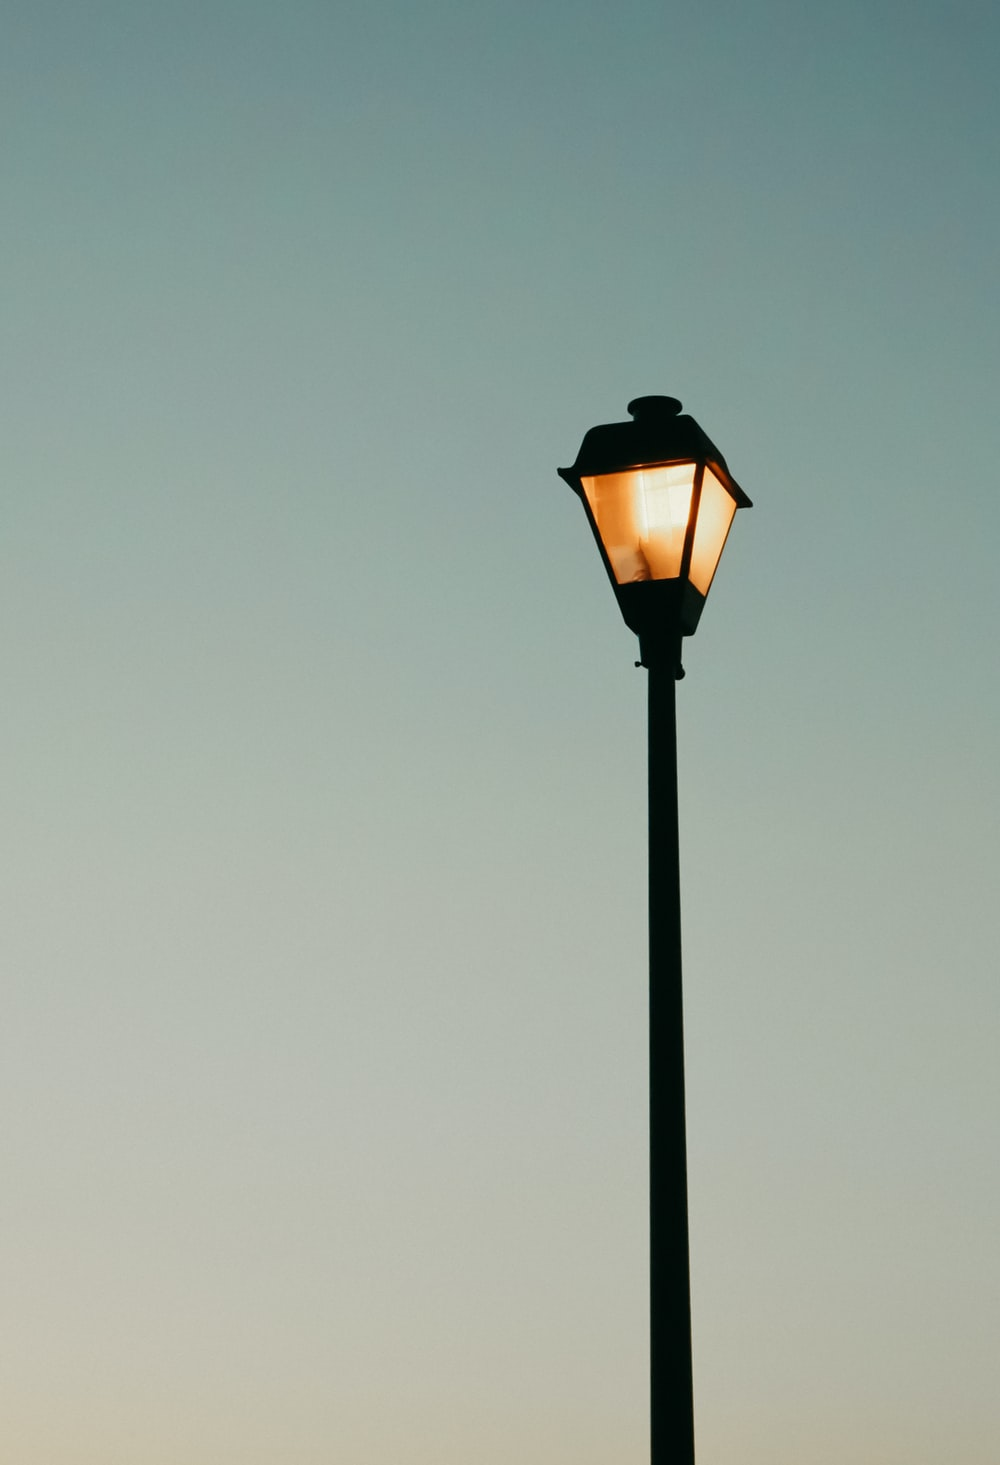 lighted black and orange lamp post